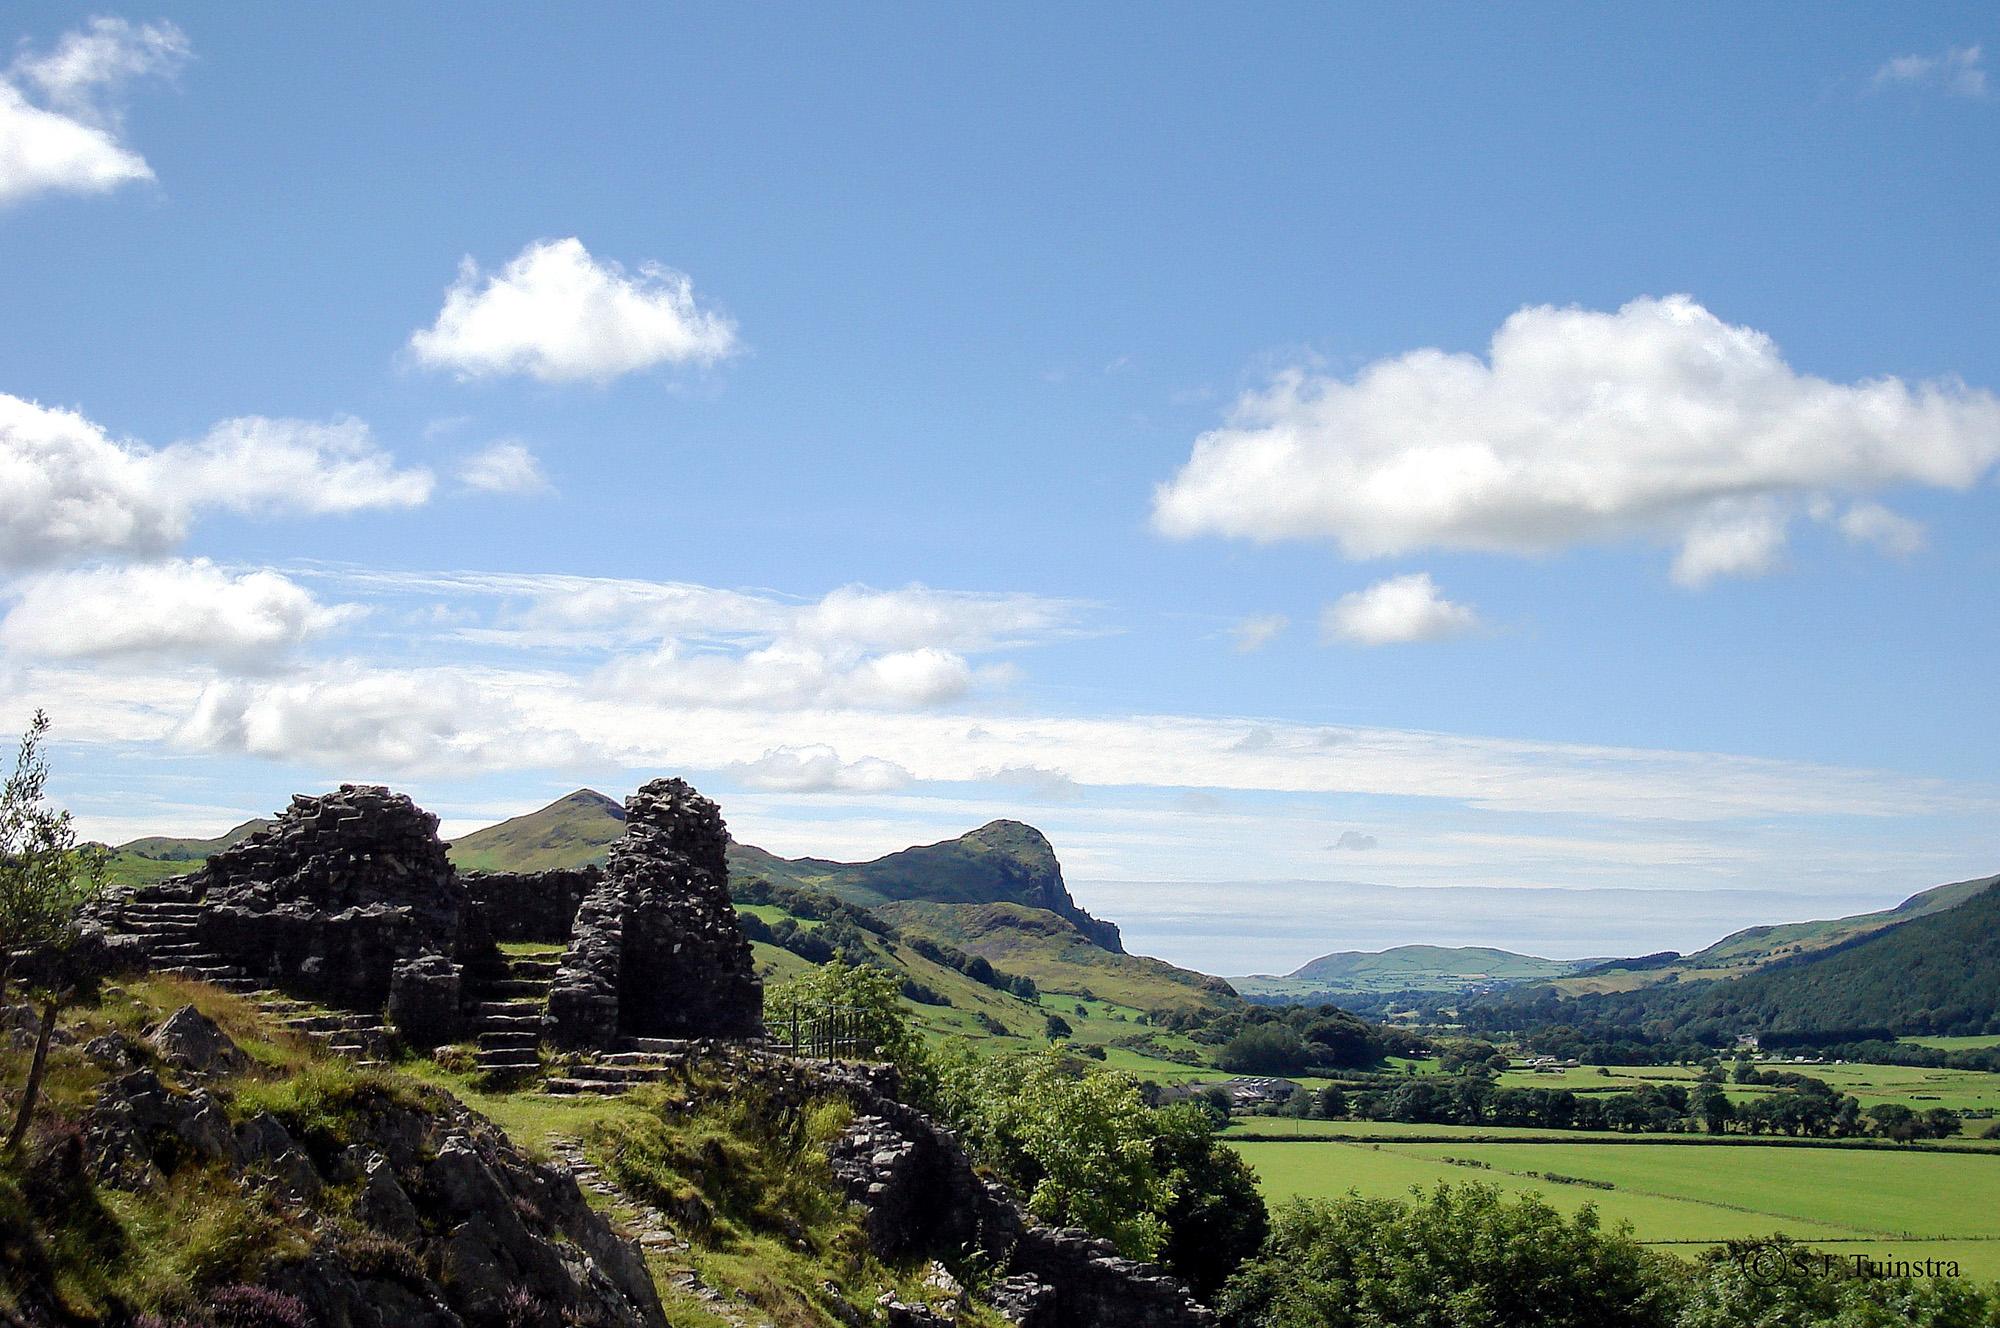 Bird's rock, Wales